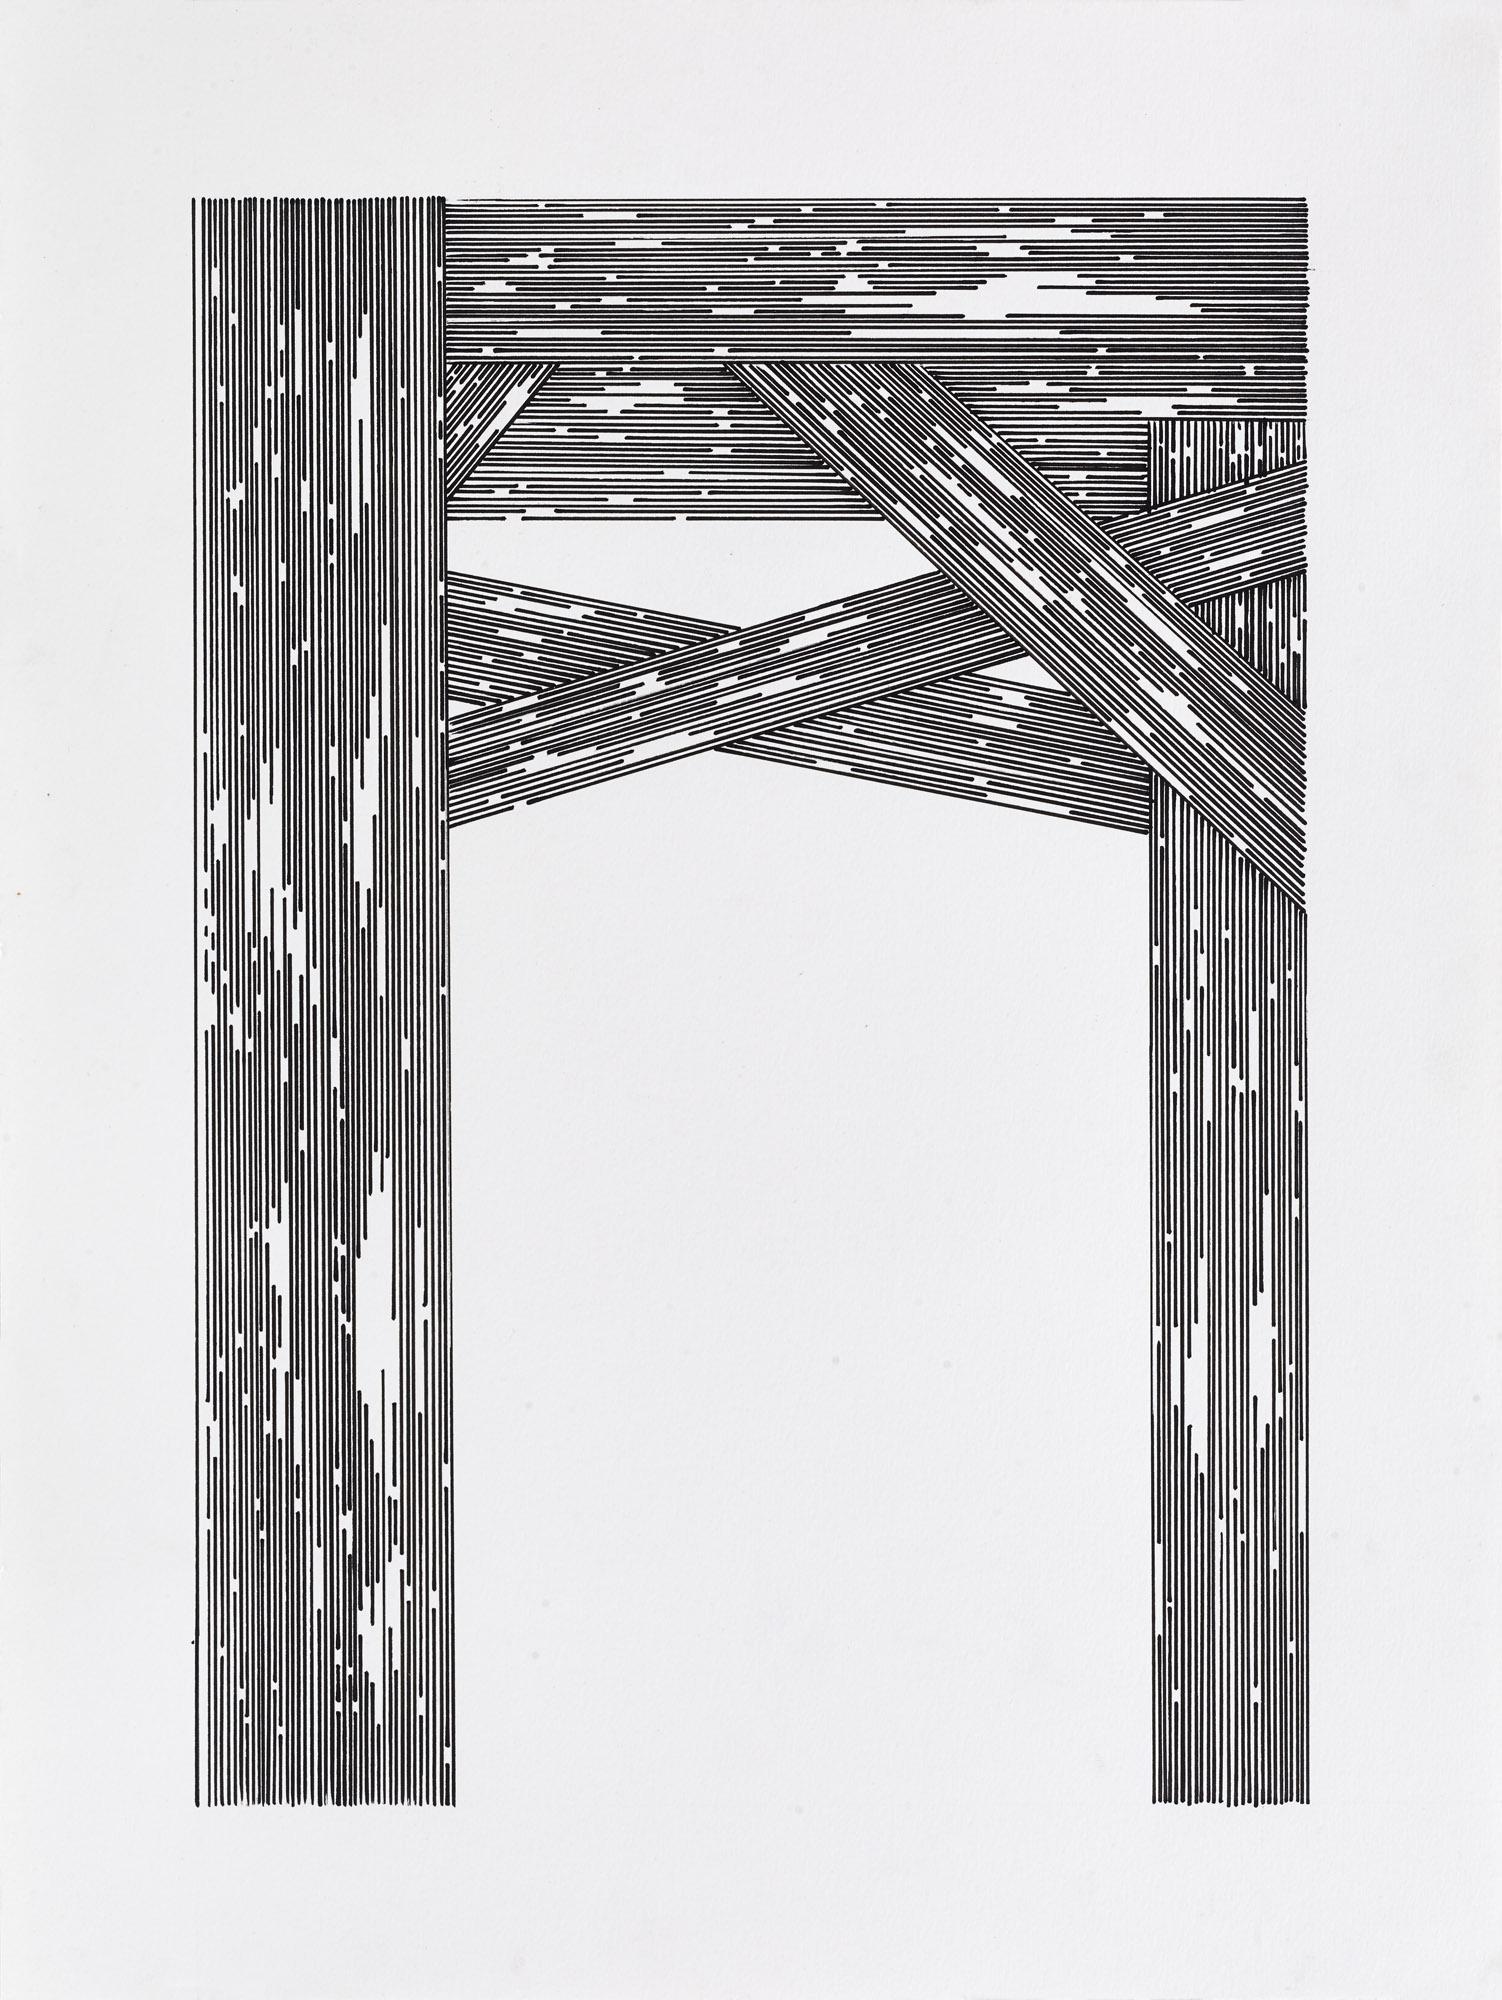 BK | P 7503 untitled | acrylic on paper | 40x30cm | 2015